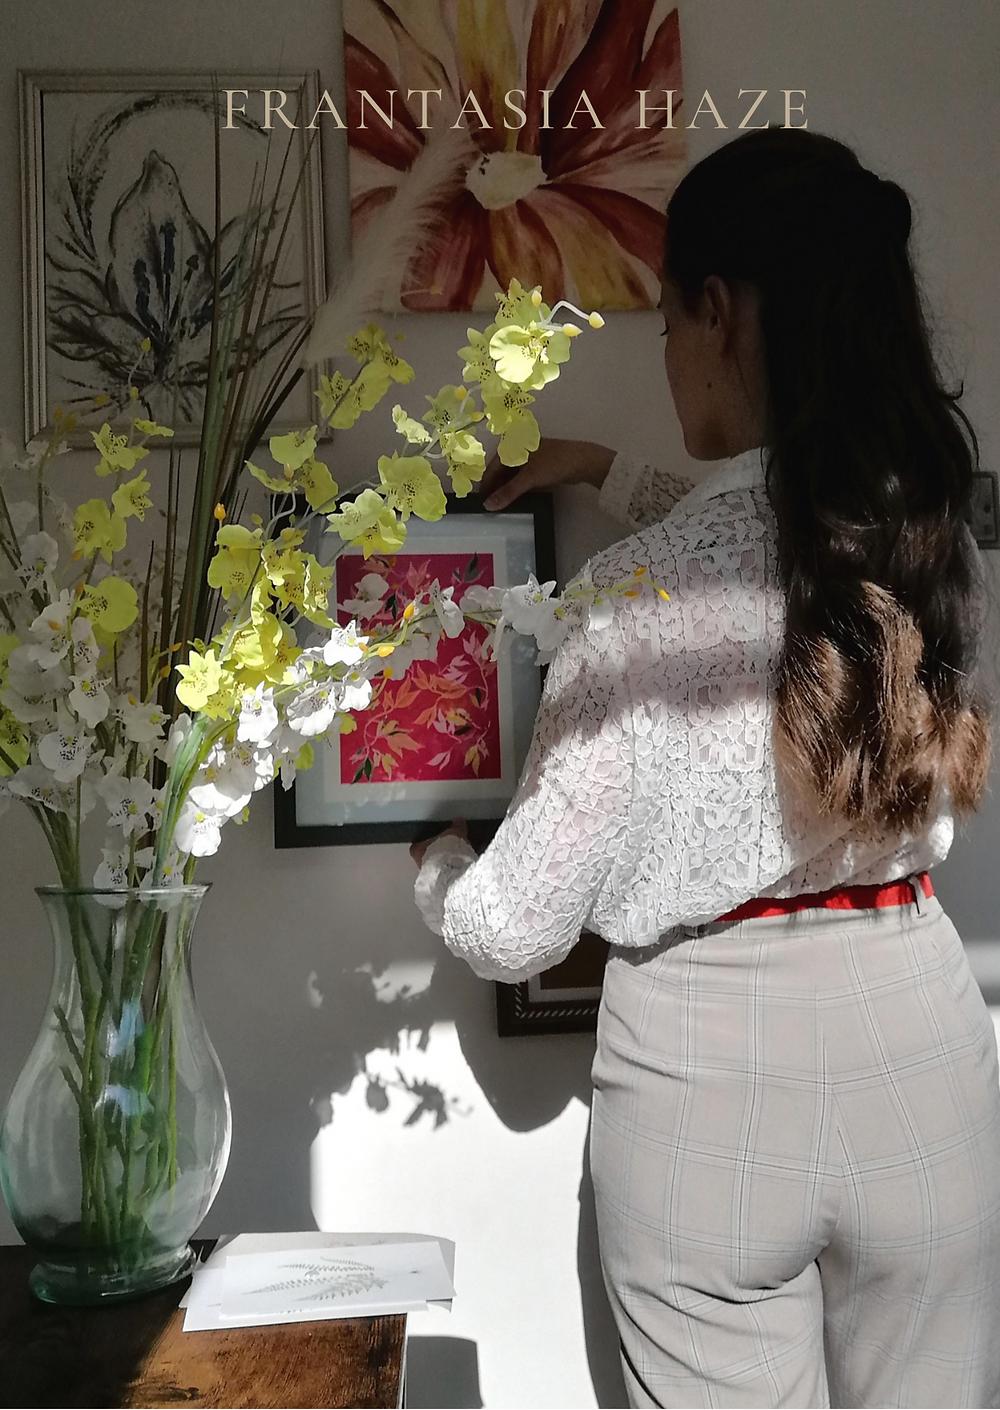 Frantasia Haze Studio. Interior Design. Floral Fabric. Curtain Fabric. Bold Fabric Design.